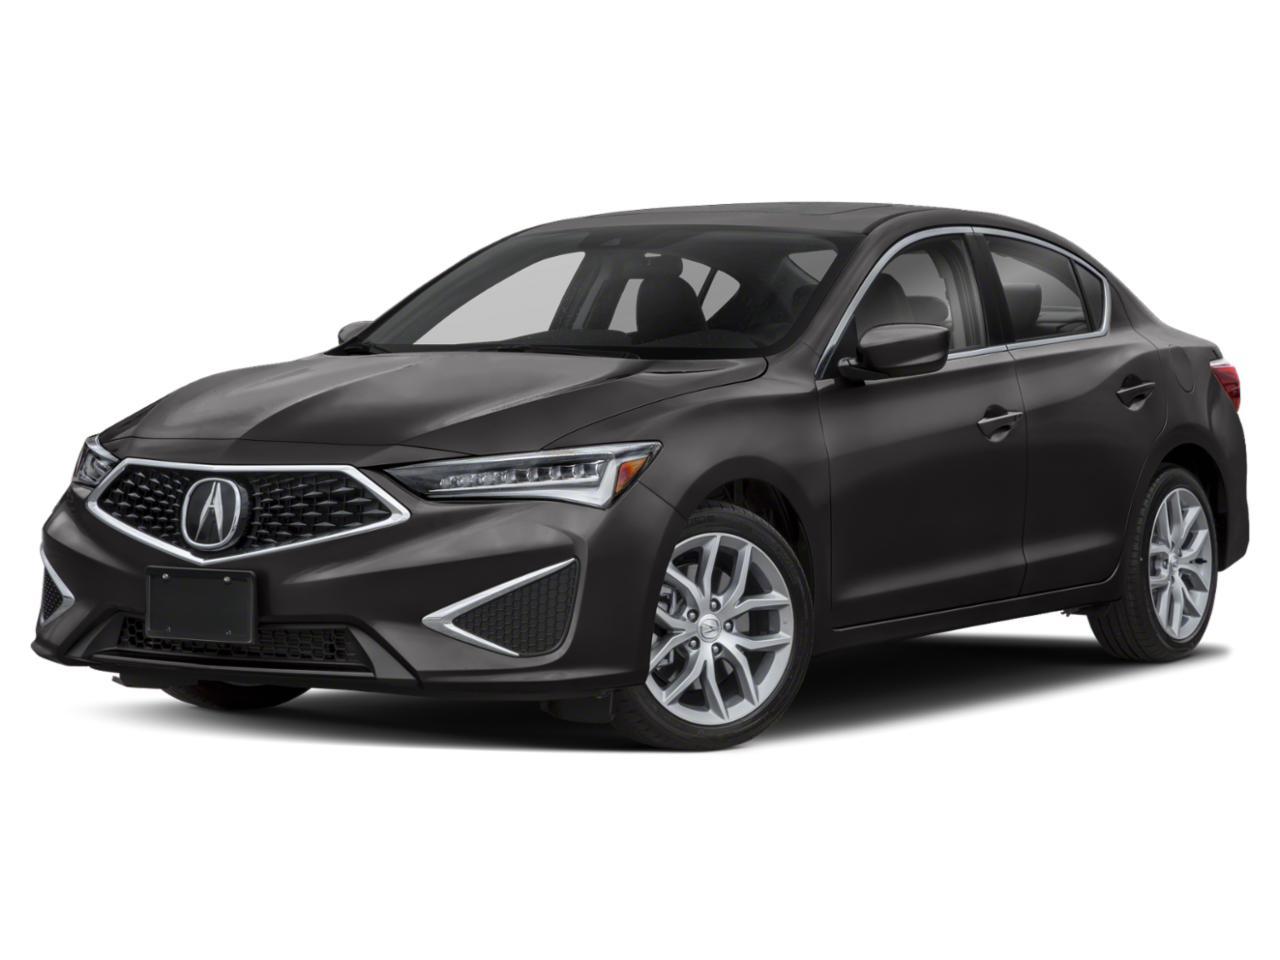 2019 Acura ILX Vehicle Photo in Killeen, TX 76541